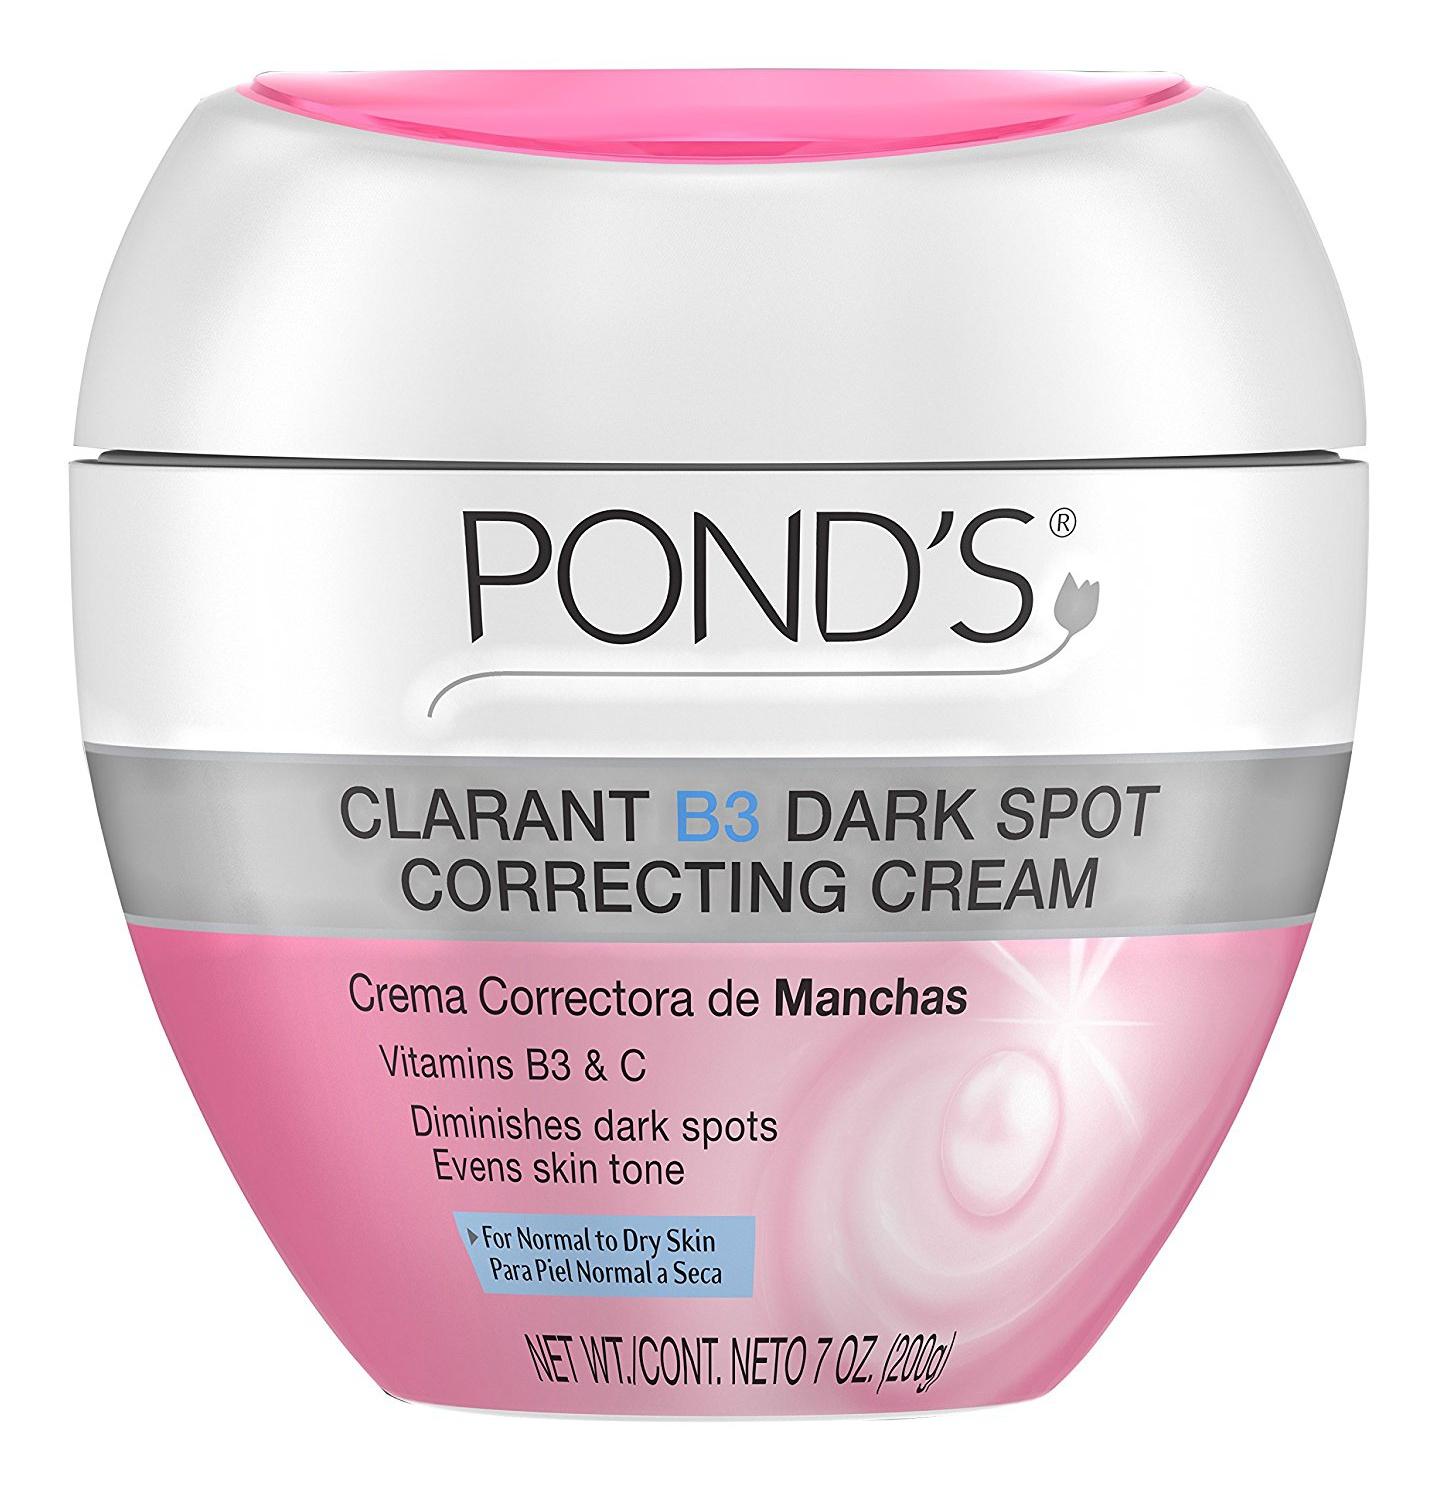 Pond's Clarant B3 Normal To Dry Skin Correcting Cream